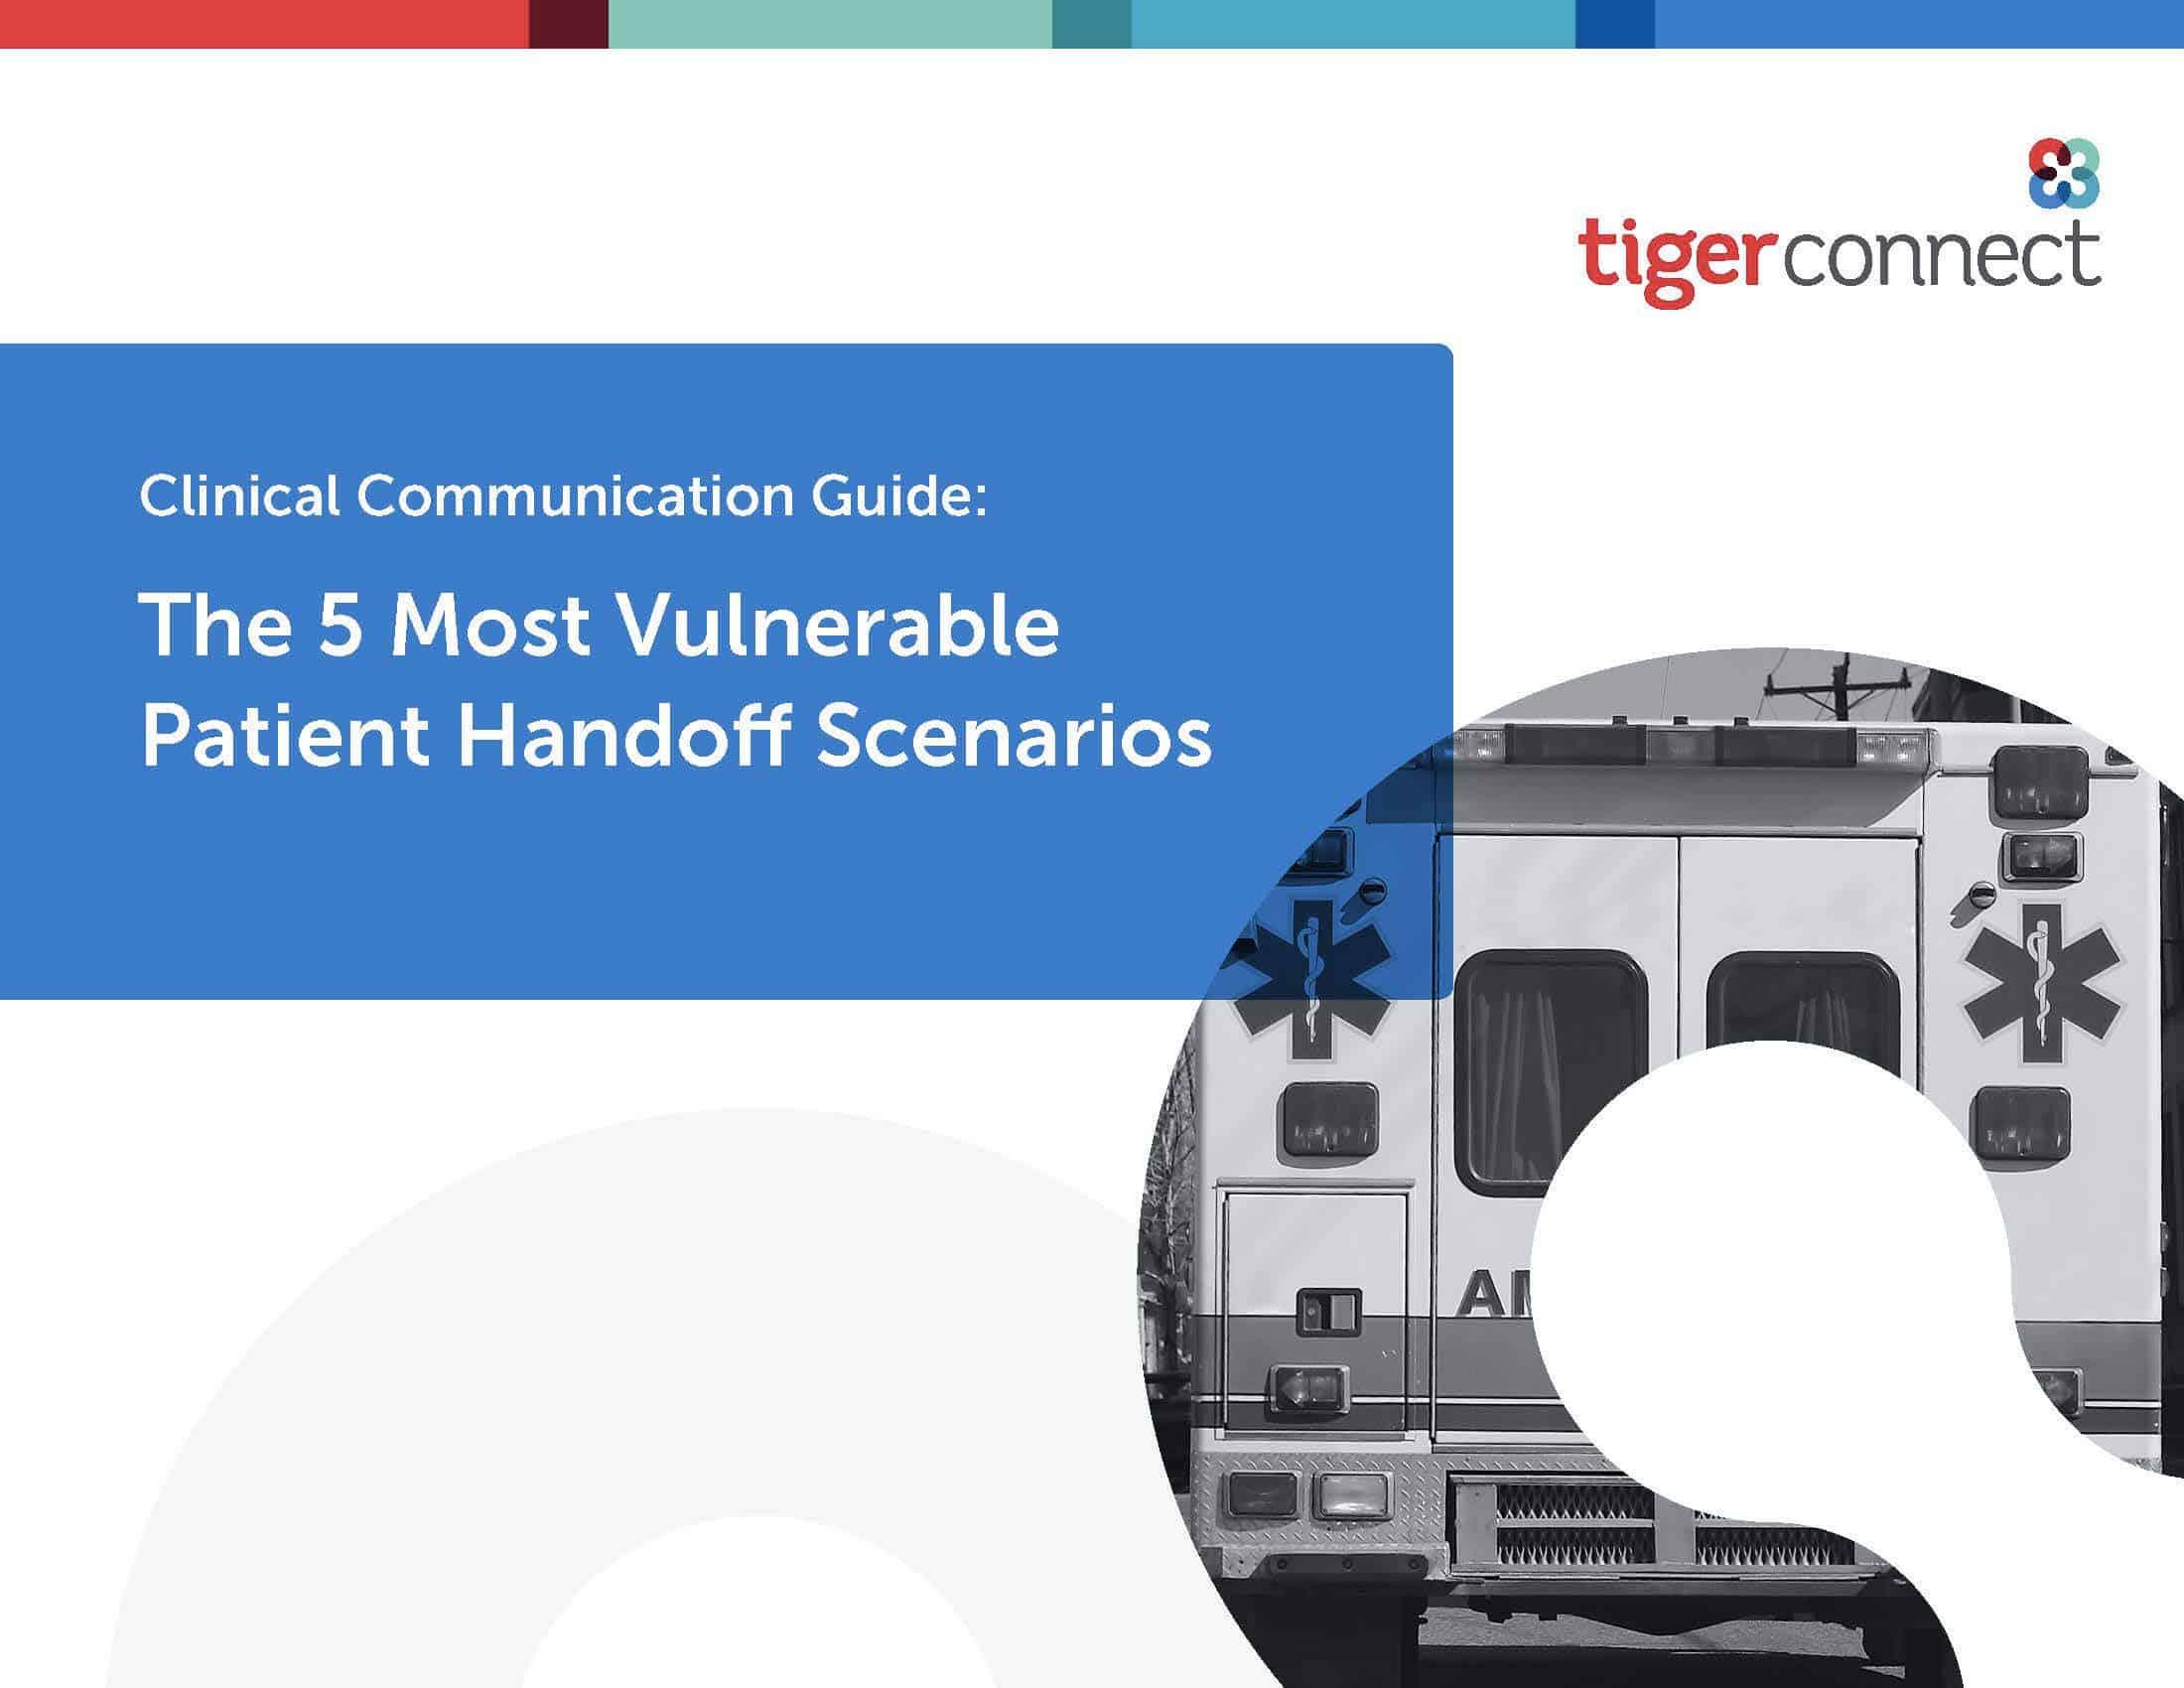 Clinical Communication Guide: The 5 Most Vulnerable Patient Handoff Scenarios eBook